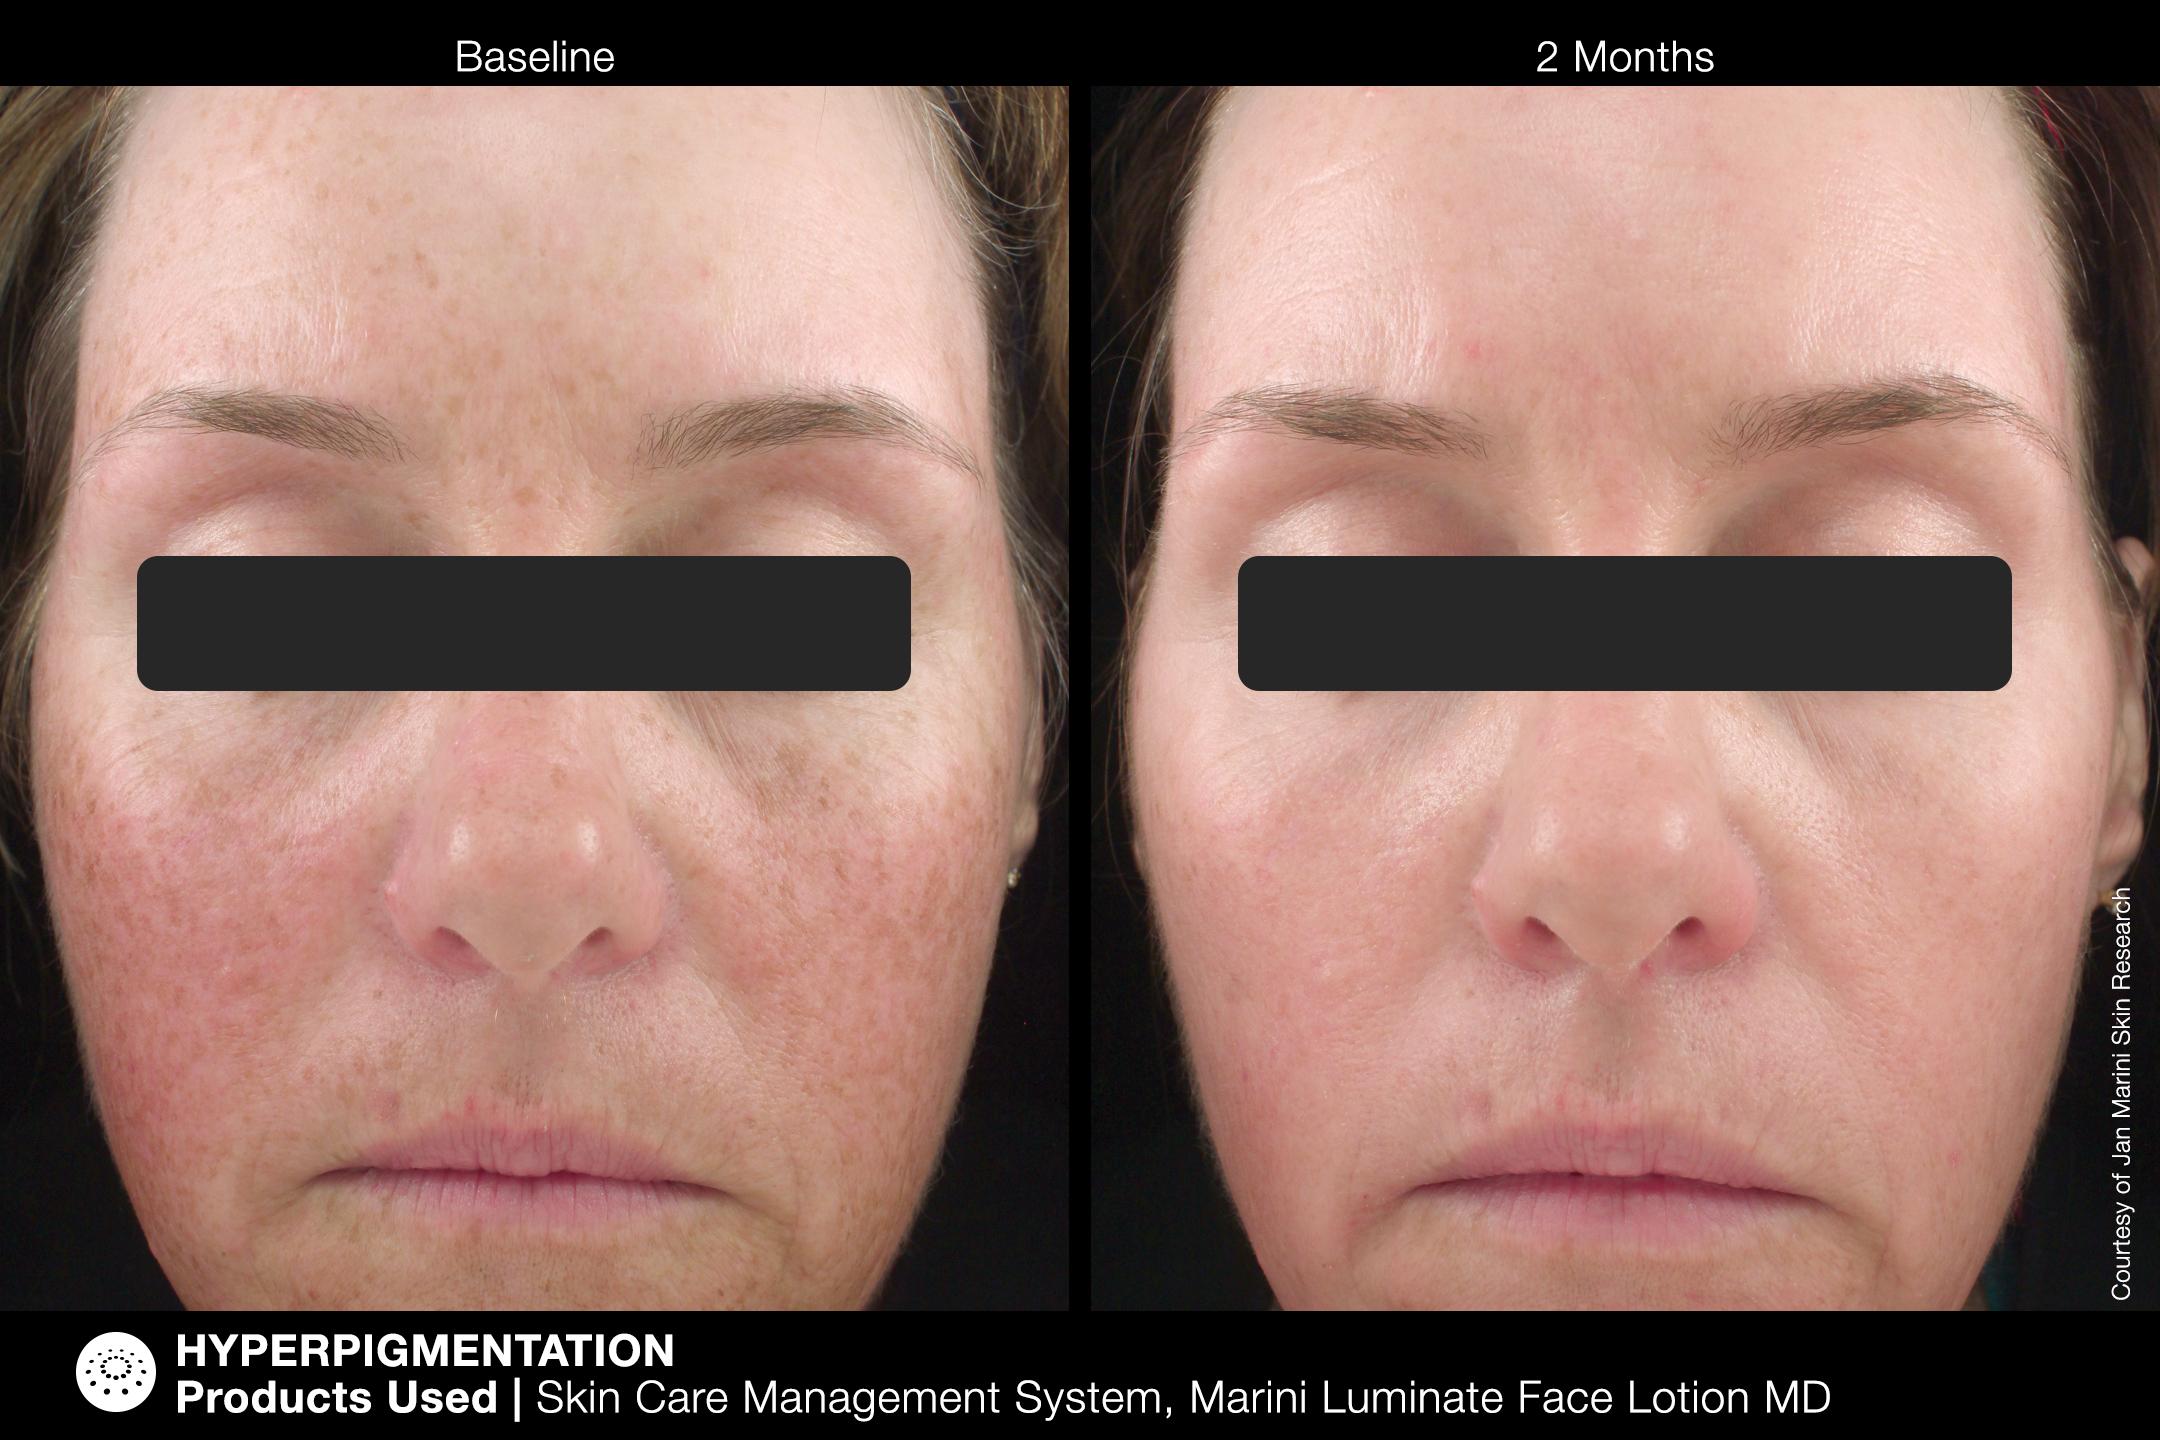 Marini Luminate Face Lotion Image (8)